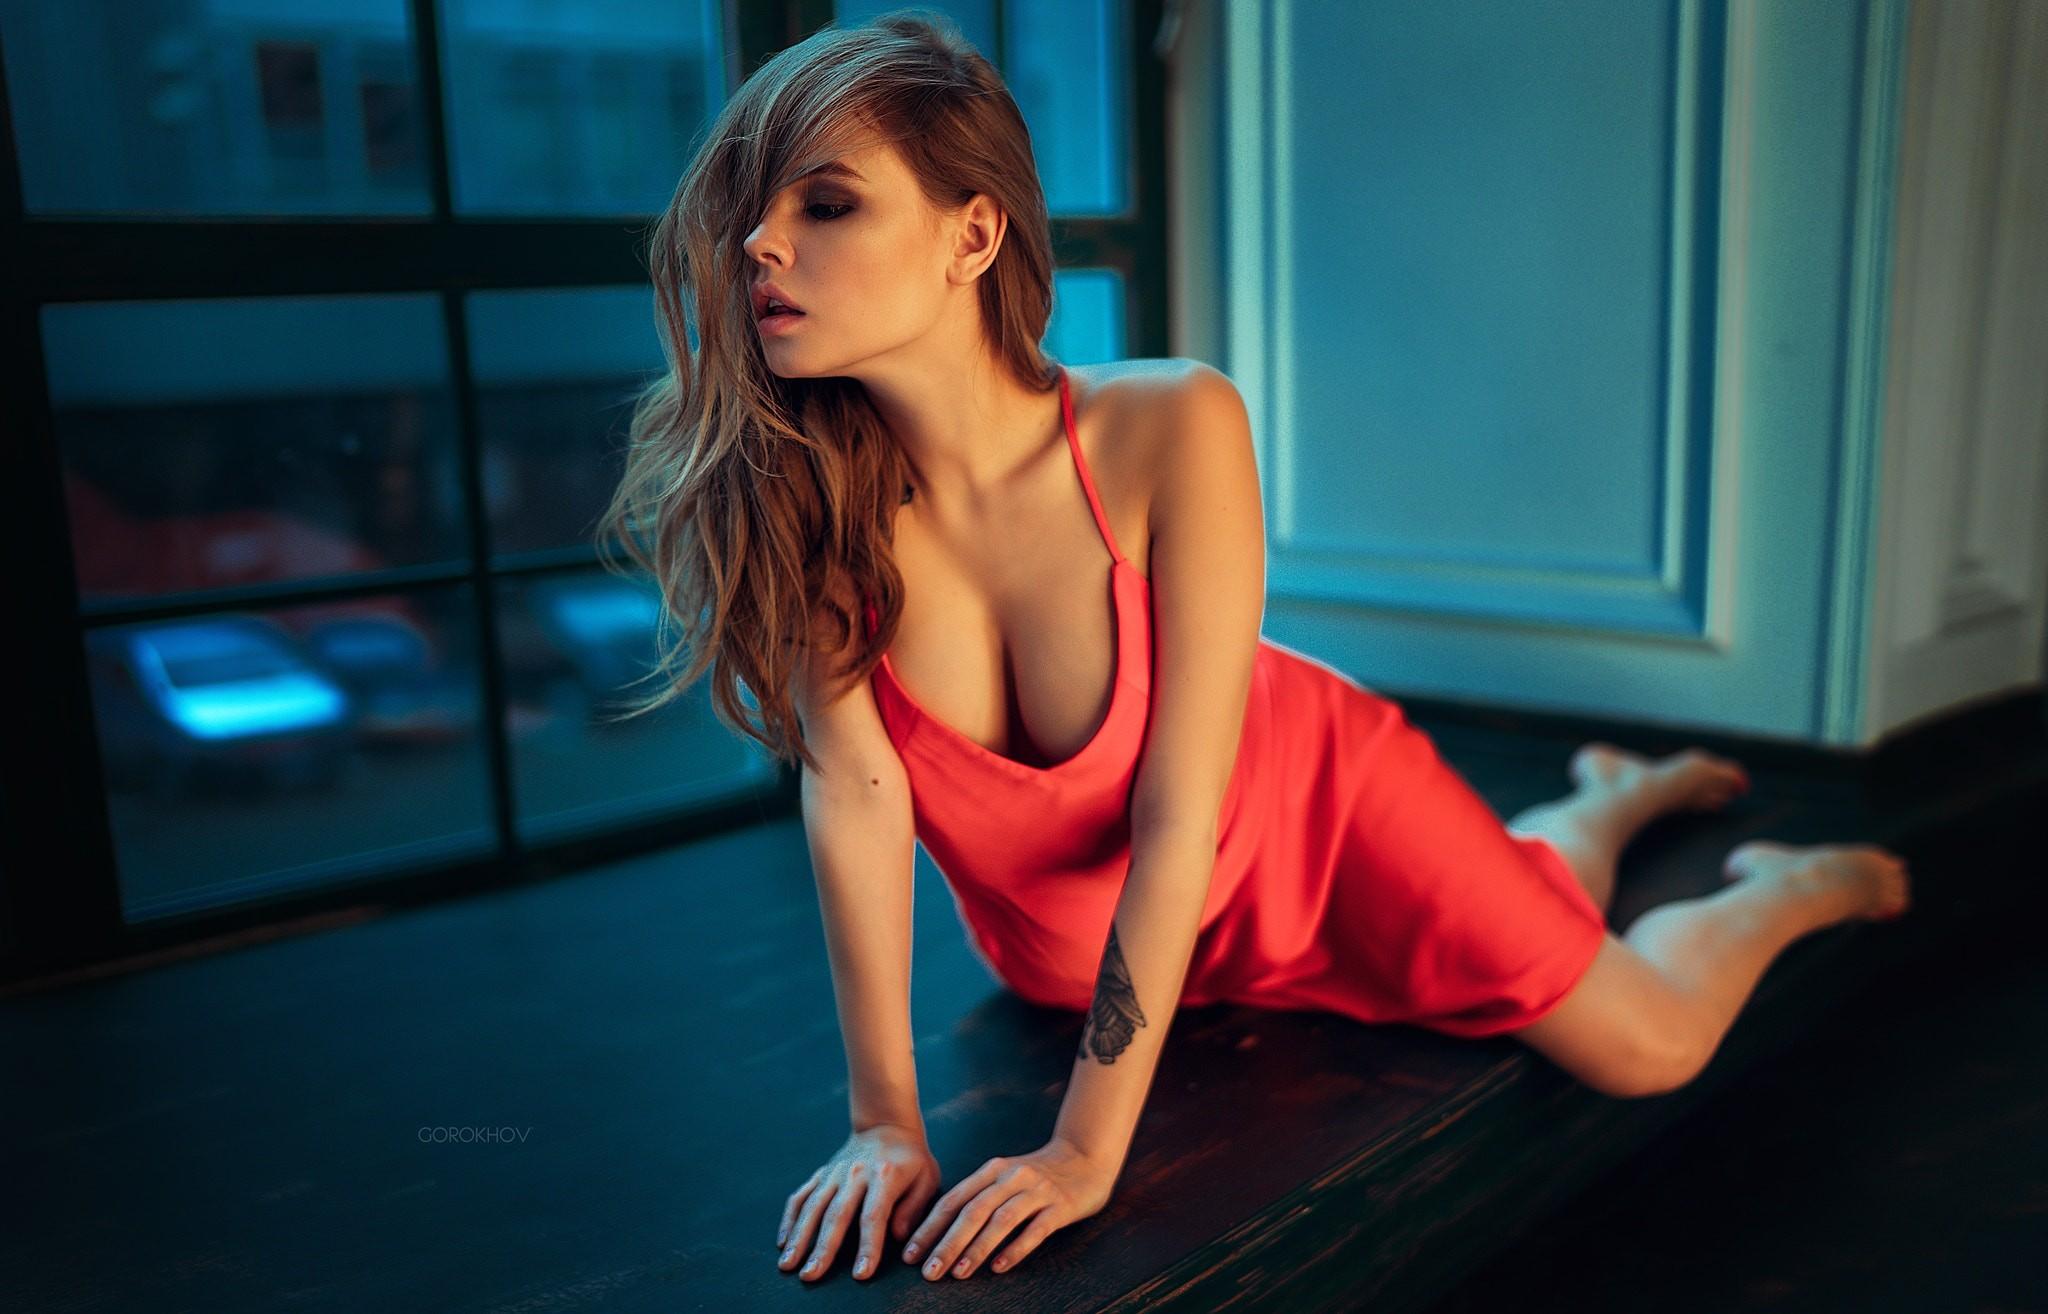 Cleavage Anastacia Cleavagey nude photos 2019